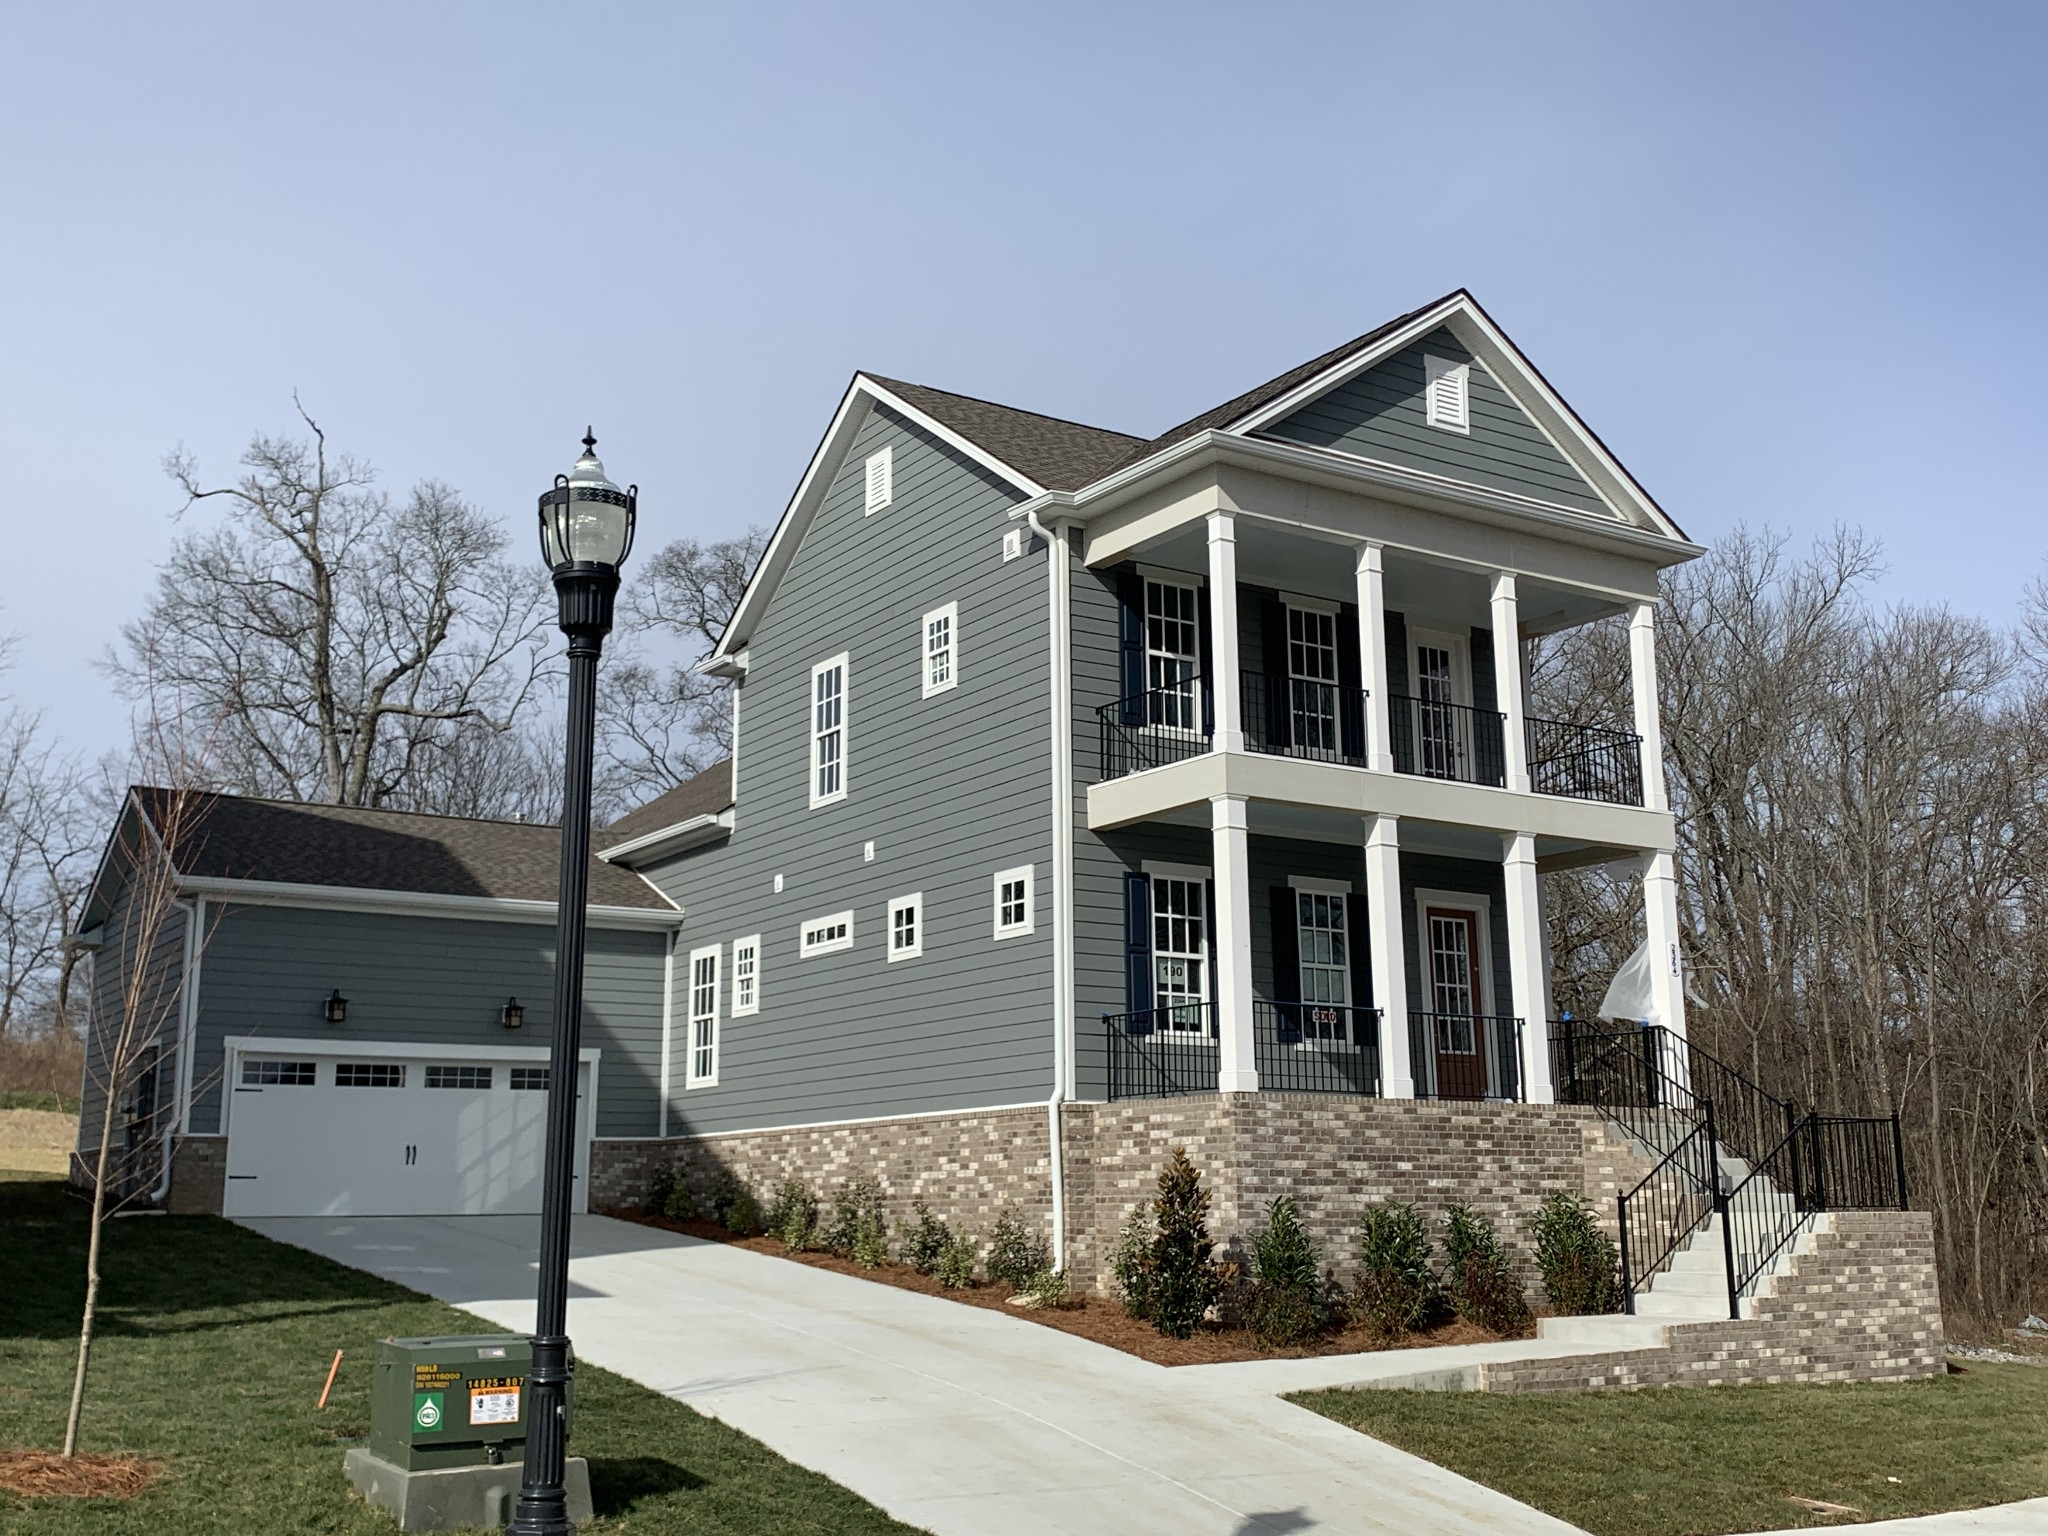 2376 Fairchild Circle #193, Nolensville, TN 37135 - Nolensville, TN real estate listing